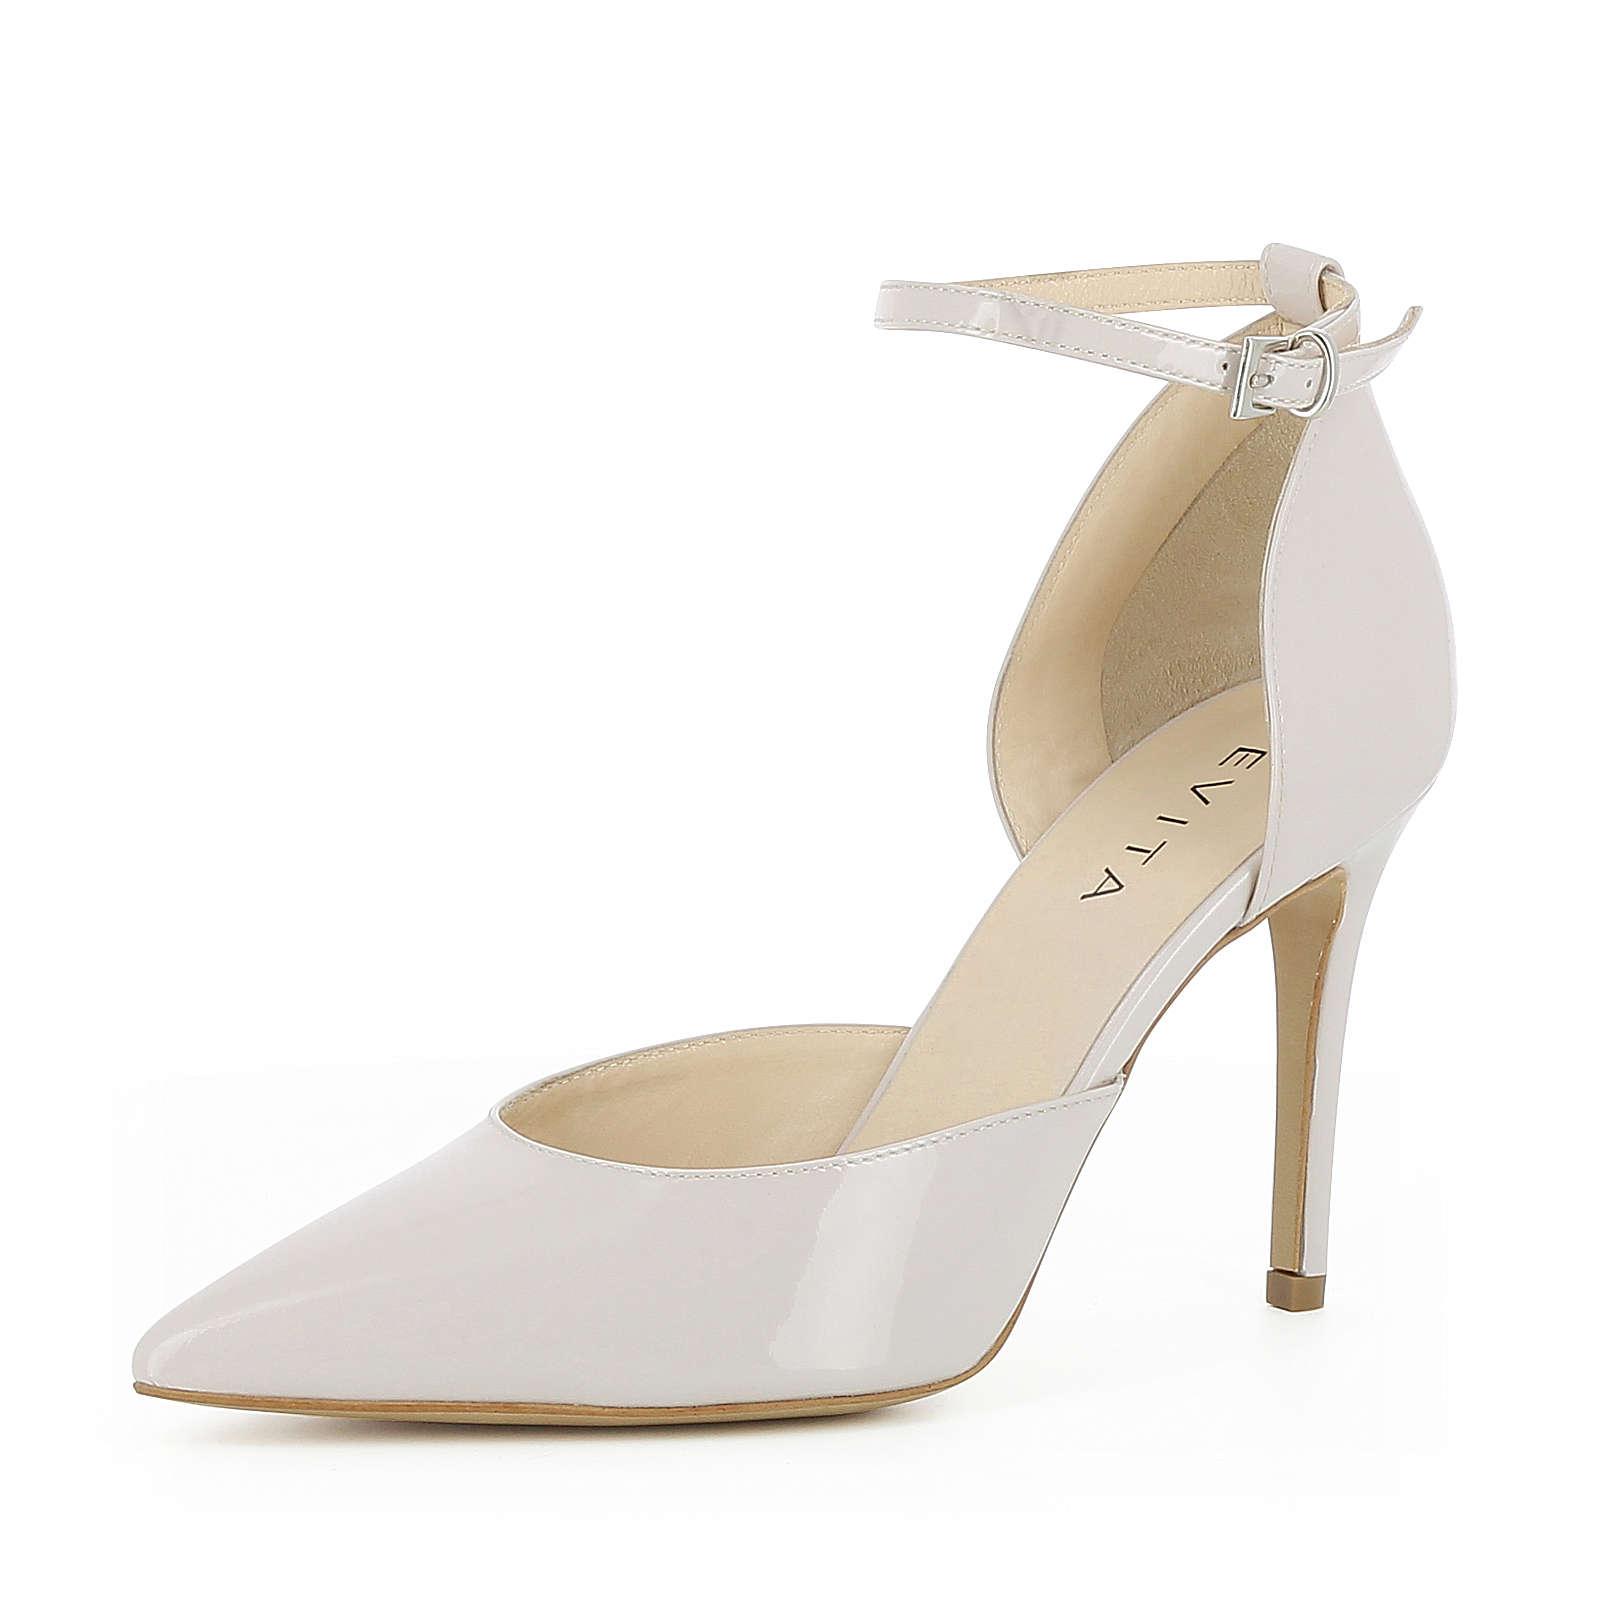 Evita Shoes Damen Pumps halboffen EMILIA Klassische Pumps creme Damen Gr. 40